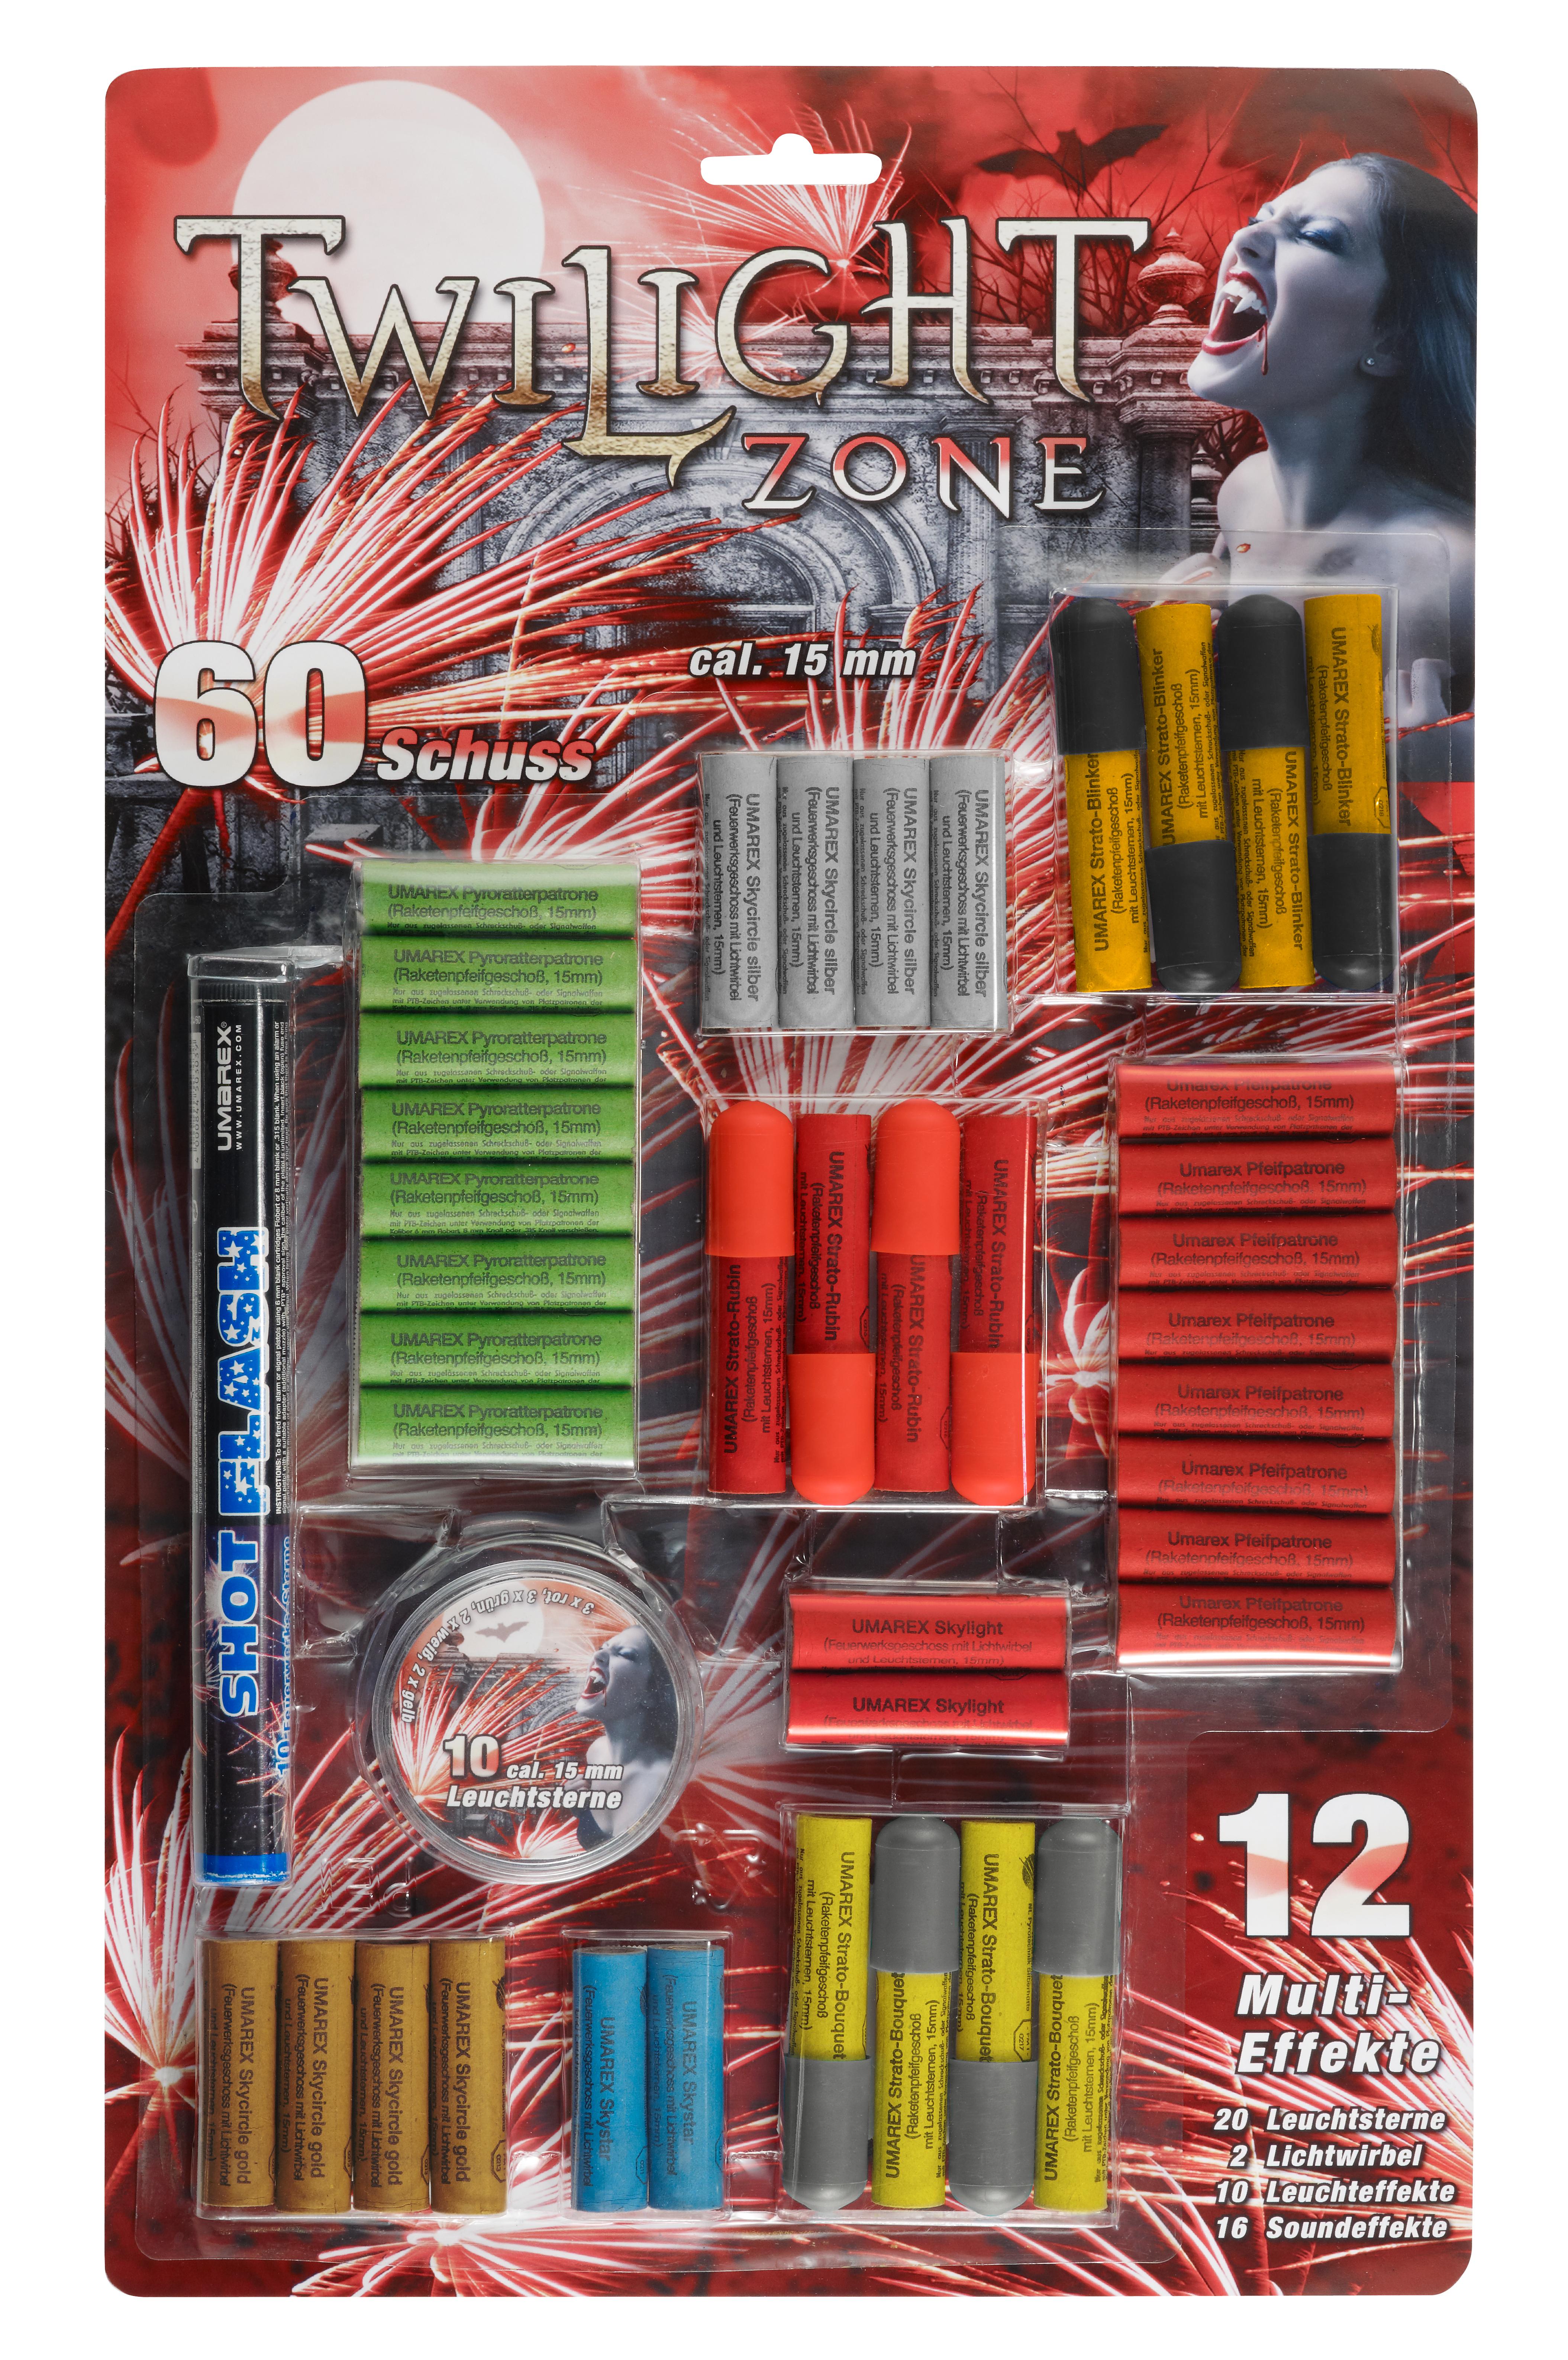 Feuerwerk Umarex Twilight Zone, 60teilig cal. 15mm Pyrotechnik